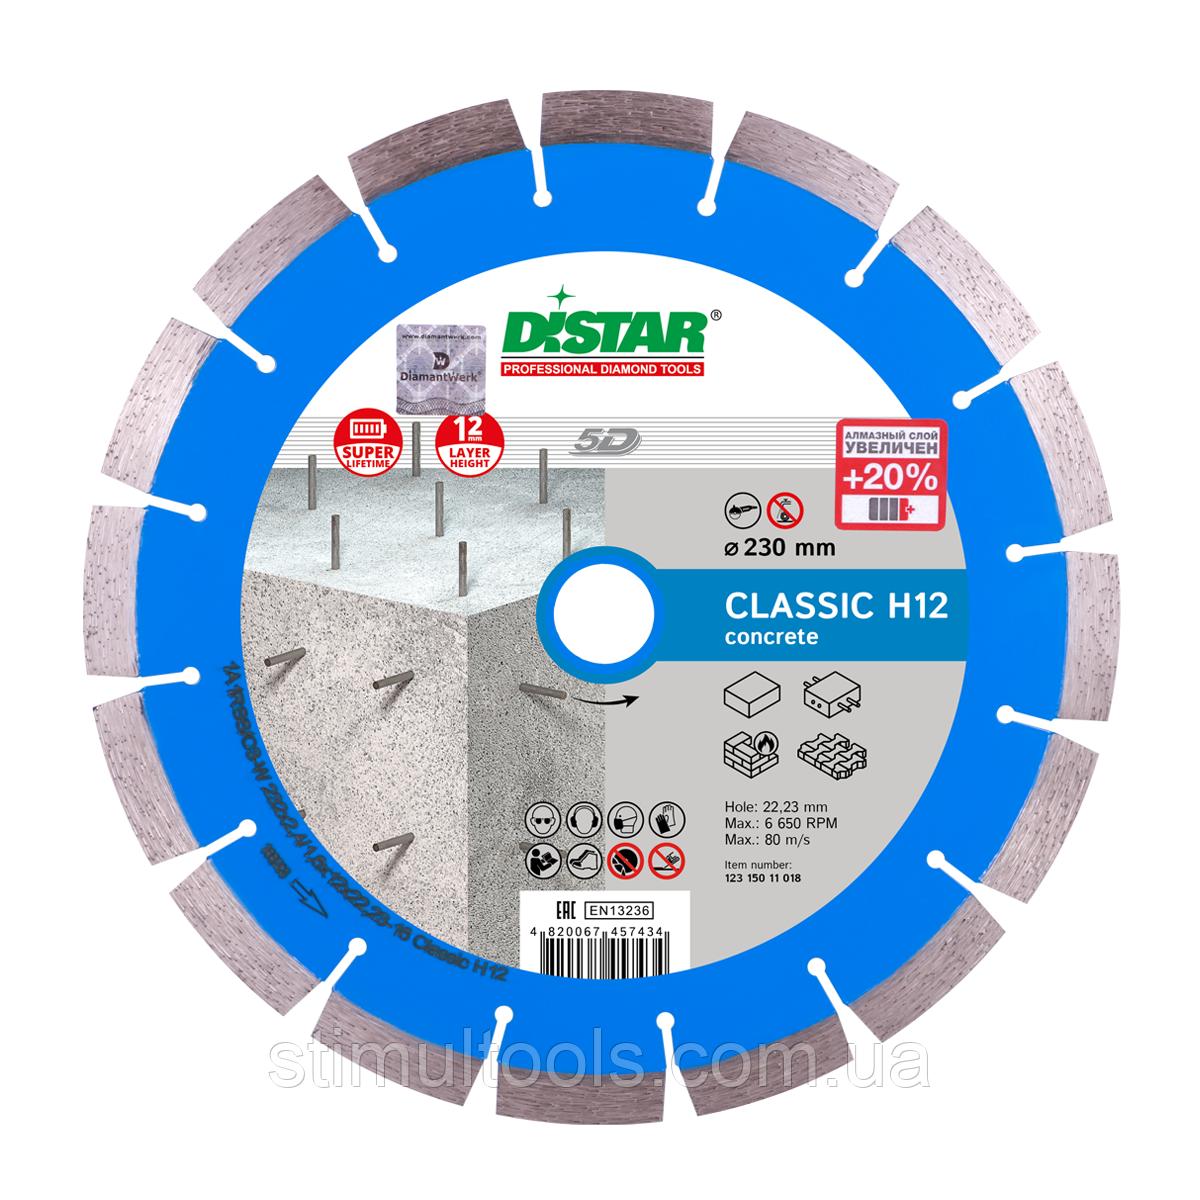 Круг алмазный отрезной Distar 1A1RSS/C3-W 125x2,2/1,3x12x22,23-10 Classic H12